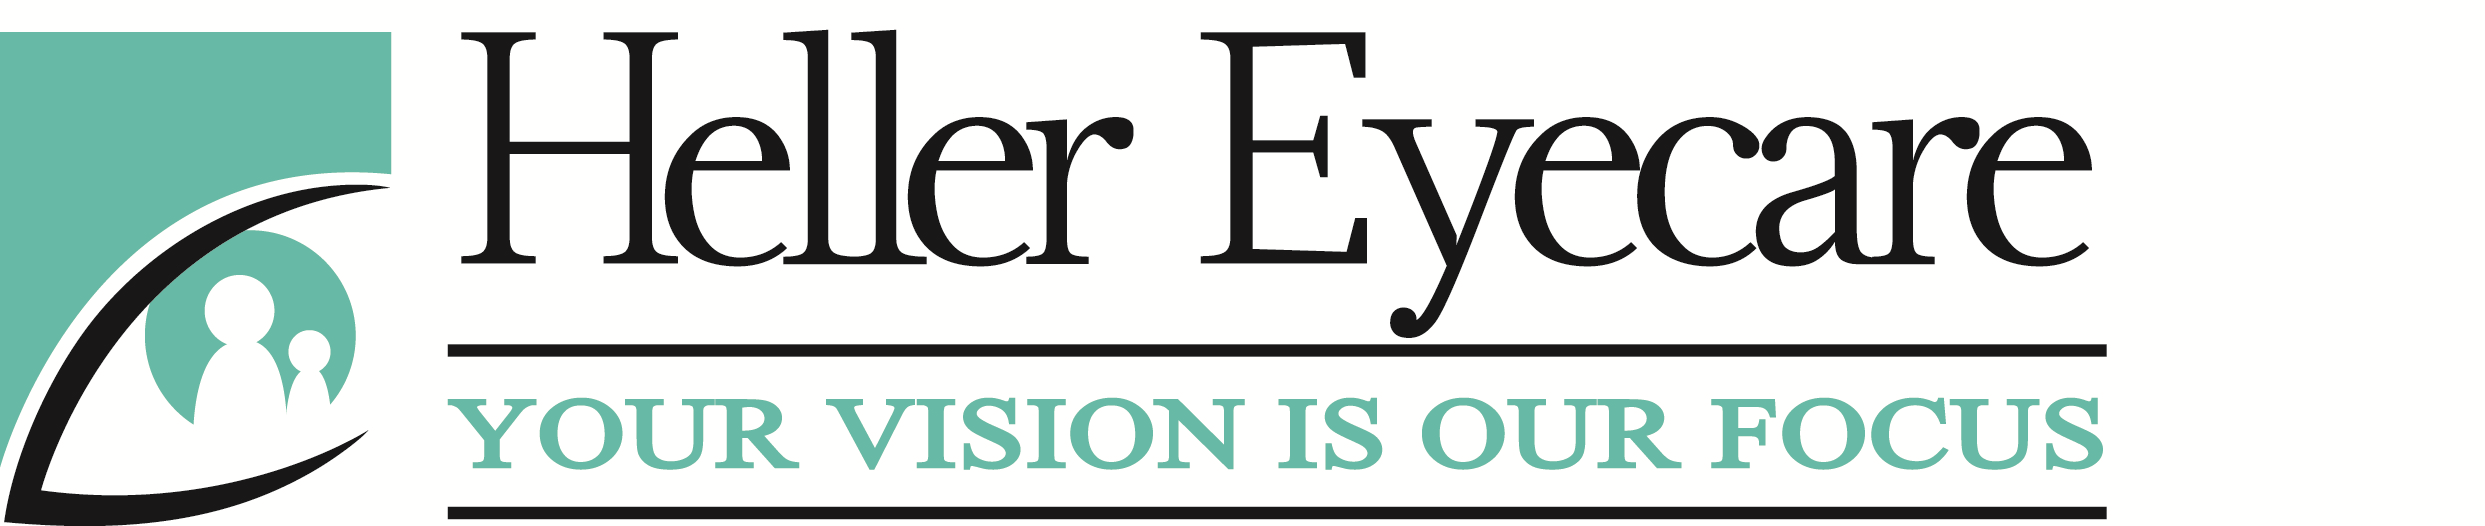 Heller Eyecare